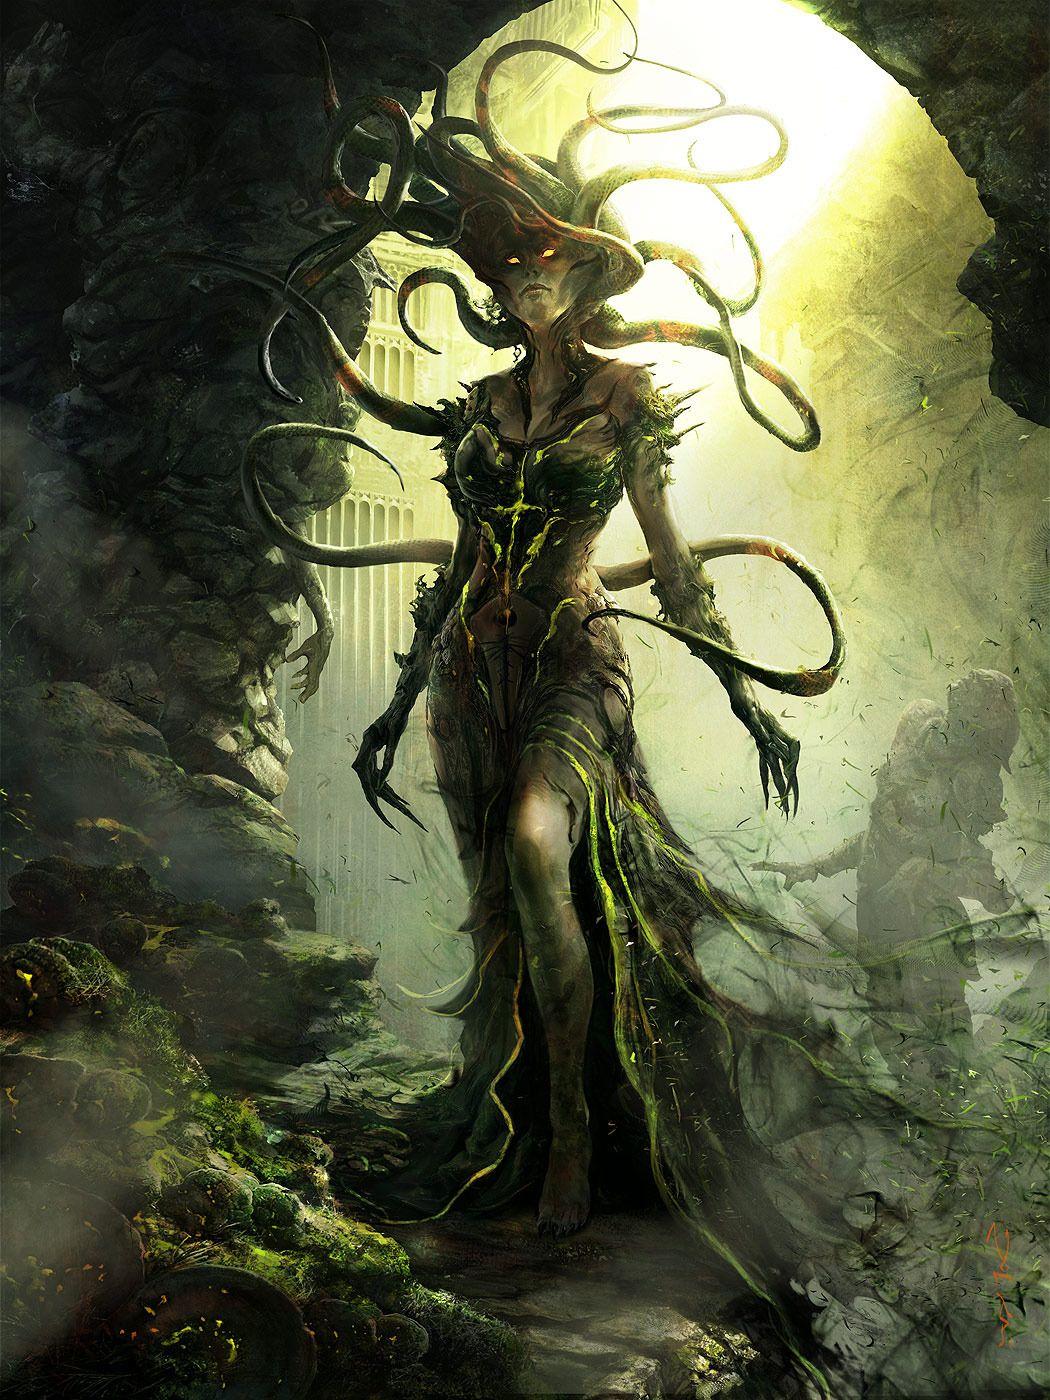 Aleksi-Vrazska-Eye-of-Death.jpg (1050×1400) Aleksi Briclot